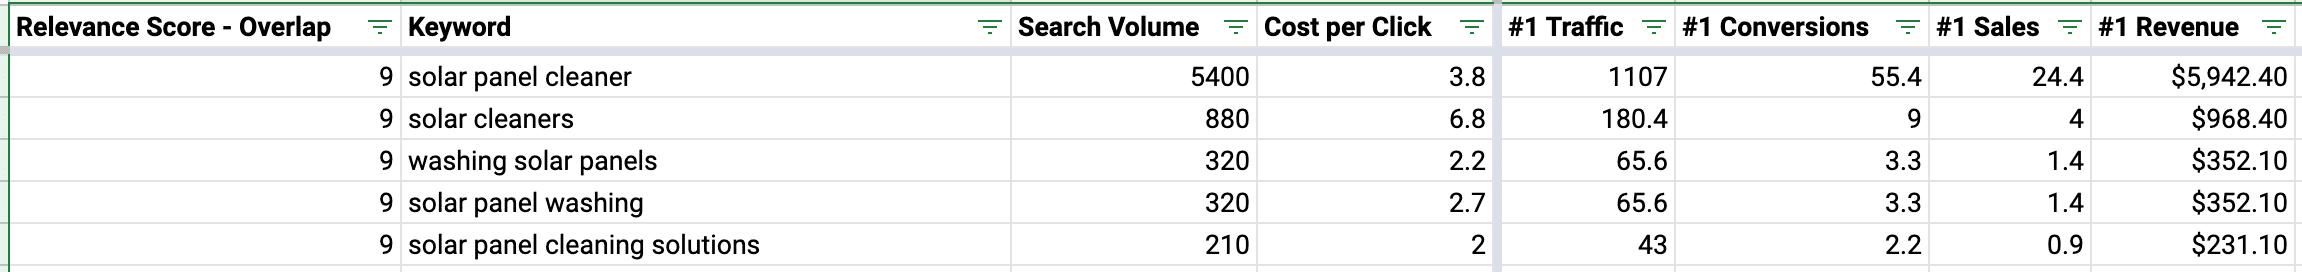 Forecast seo report data sample